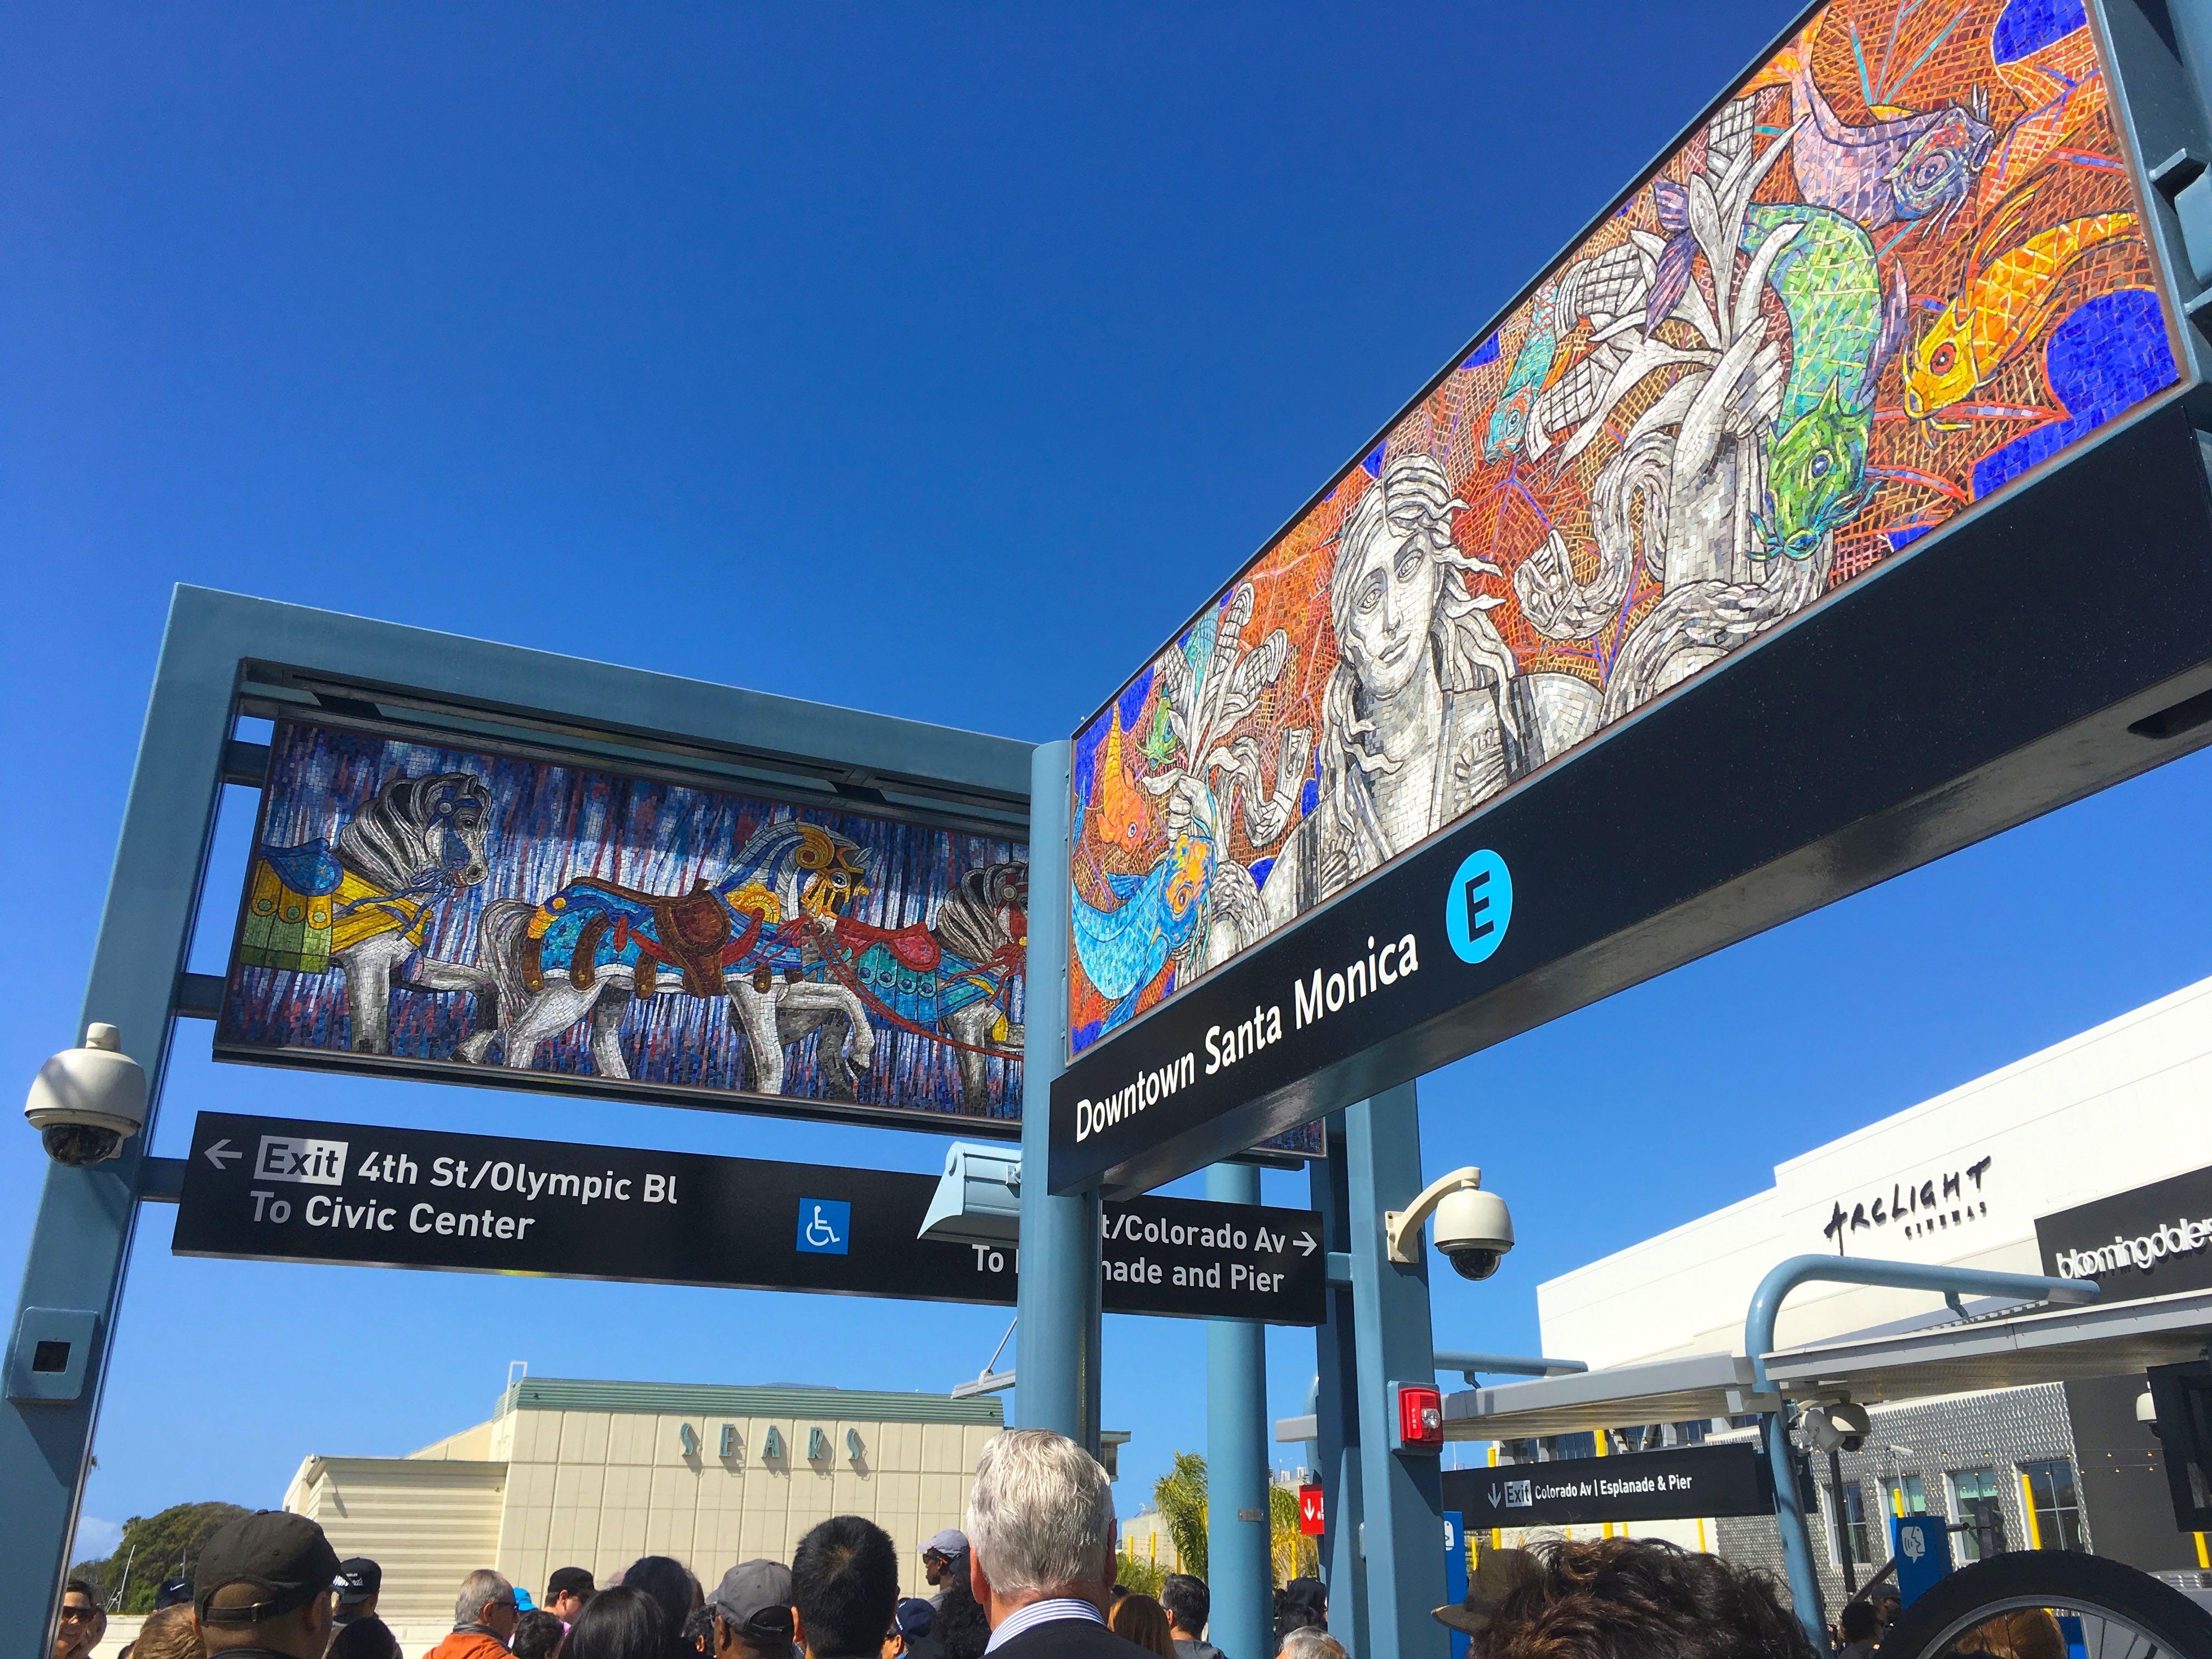 Opening day of Metro line to Santa Monica